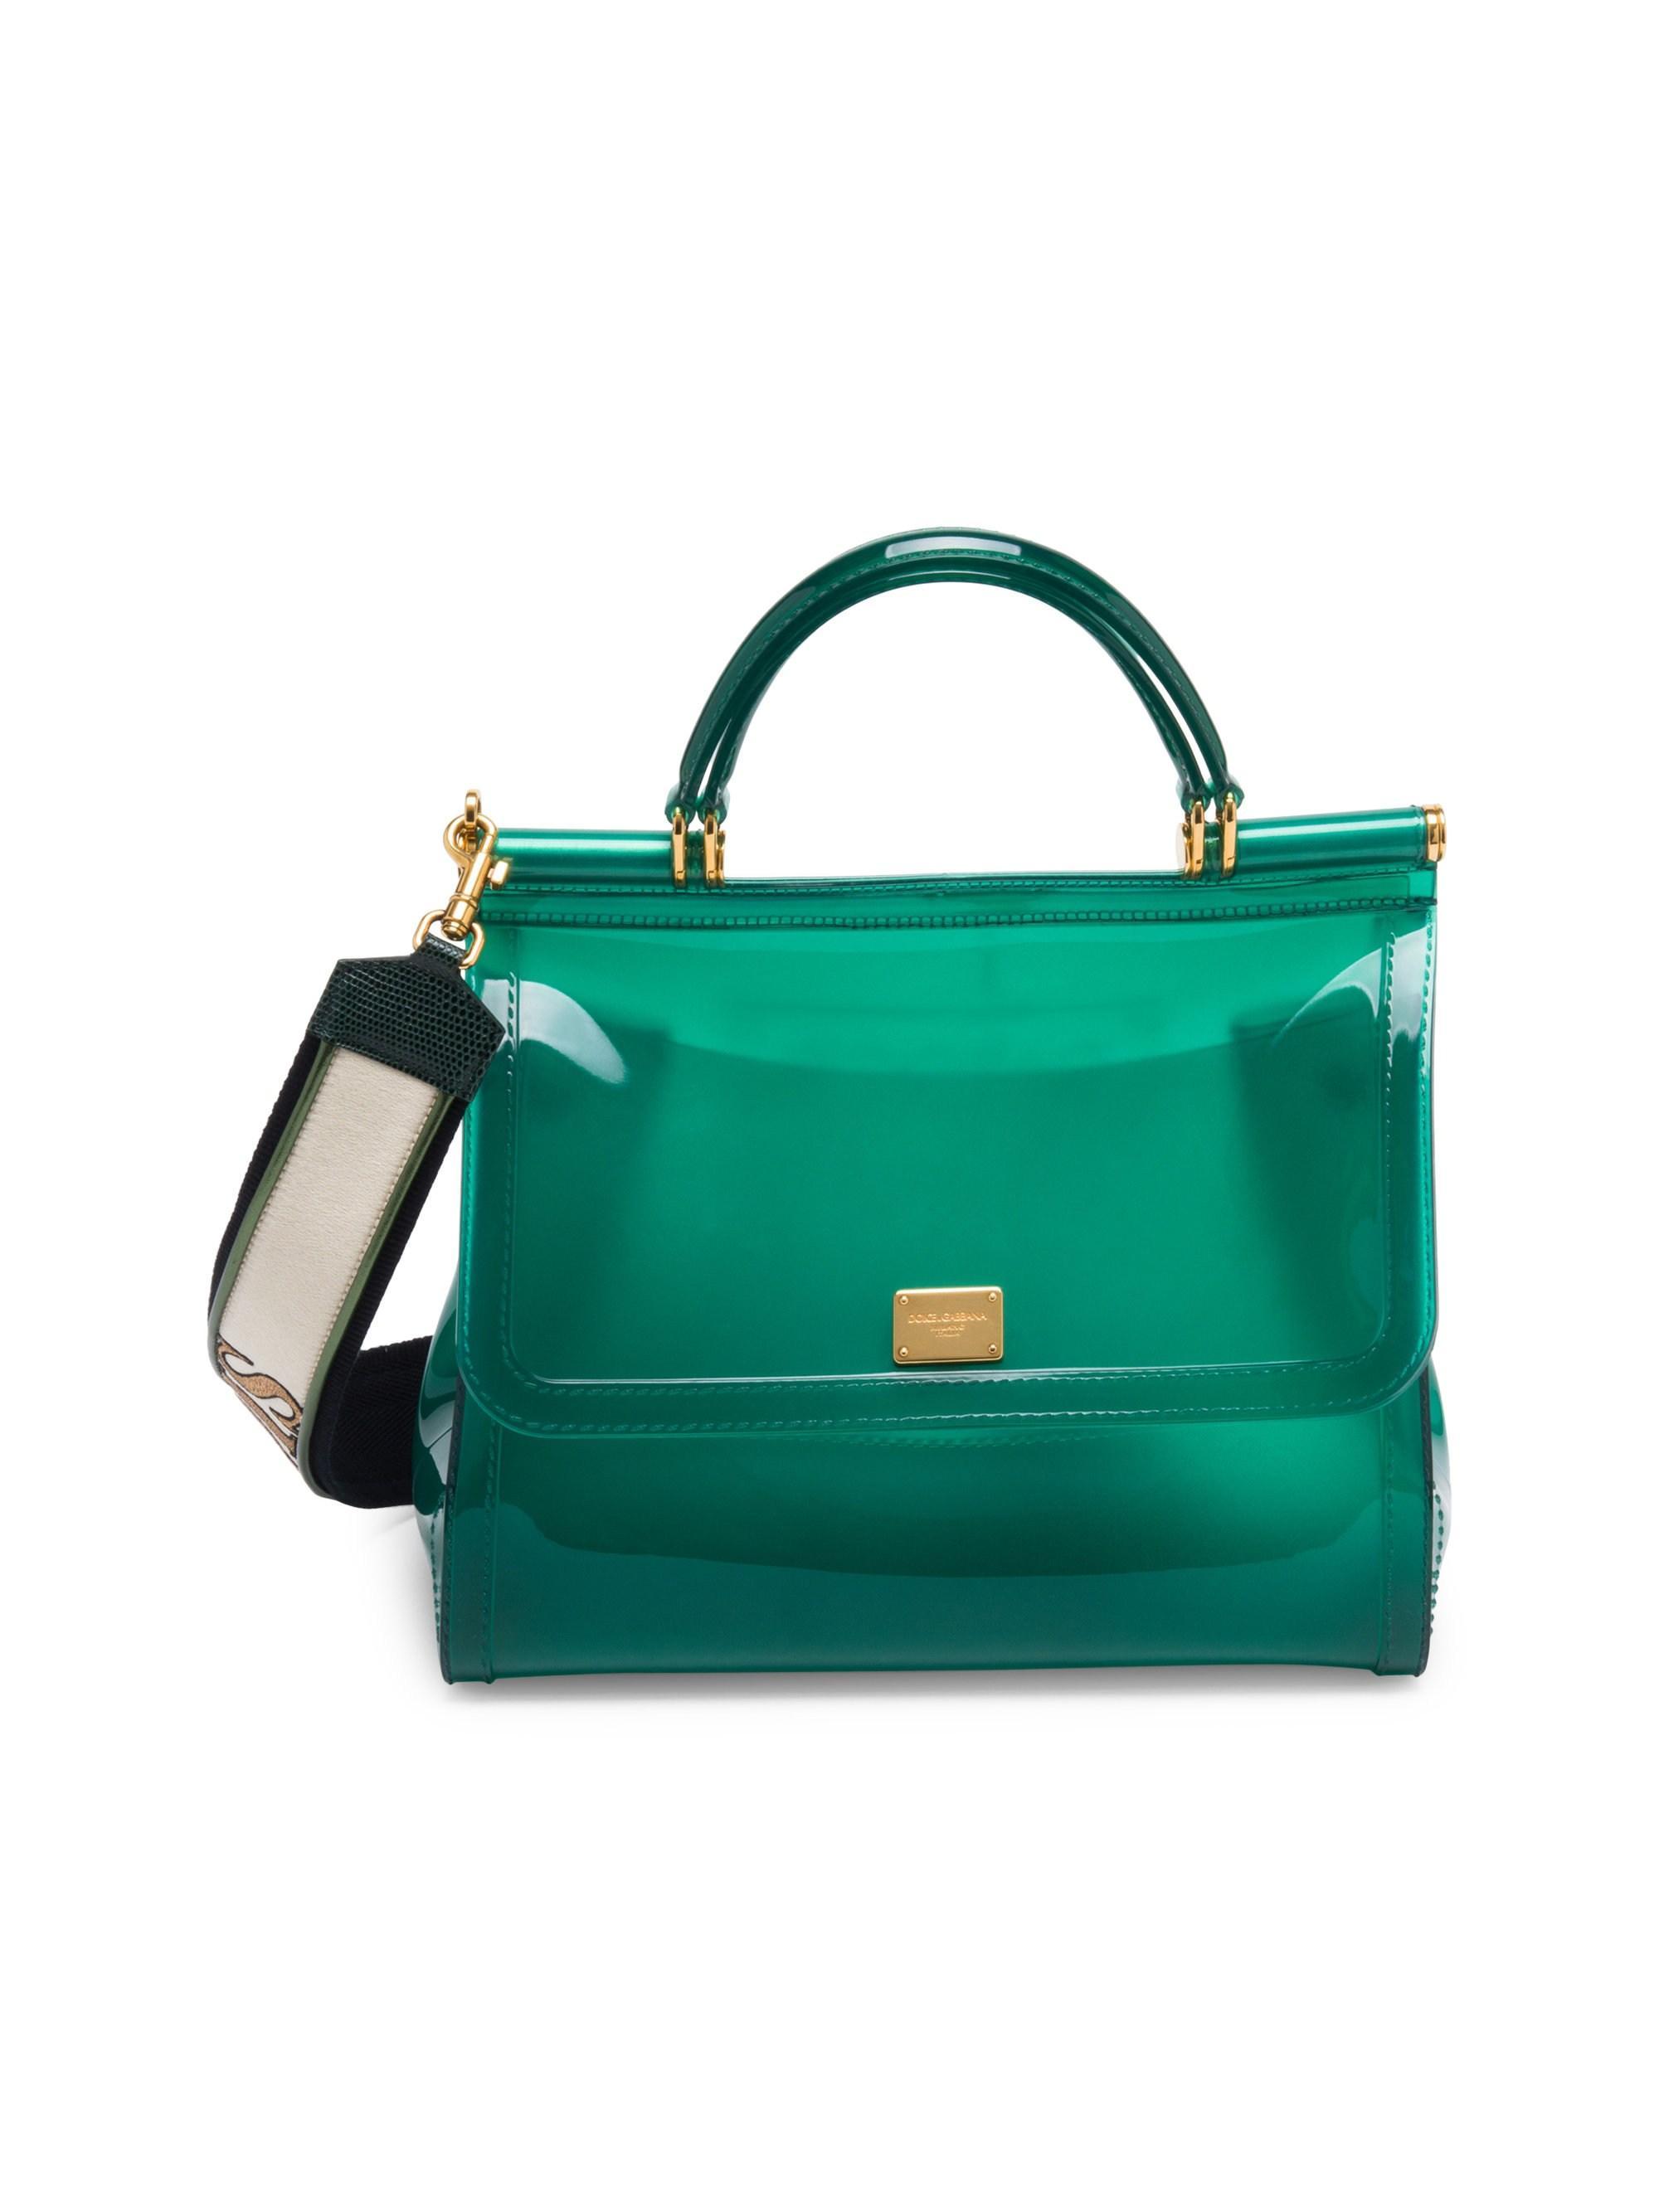 Lyst - Dolce   Gabbana Sicily Pvc Top Handle Bag in Green 944caac80c